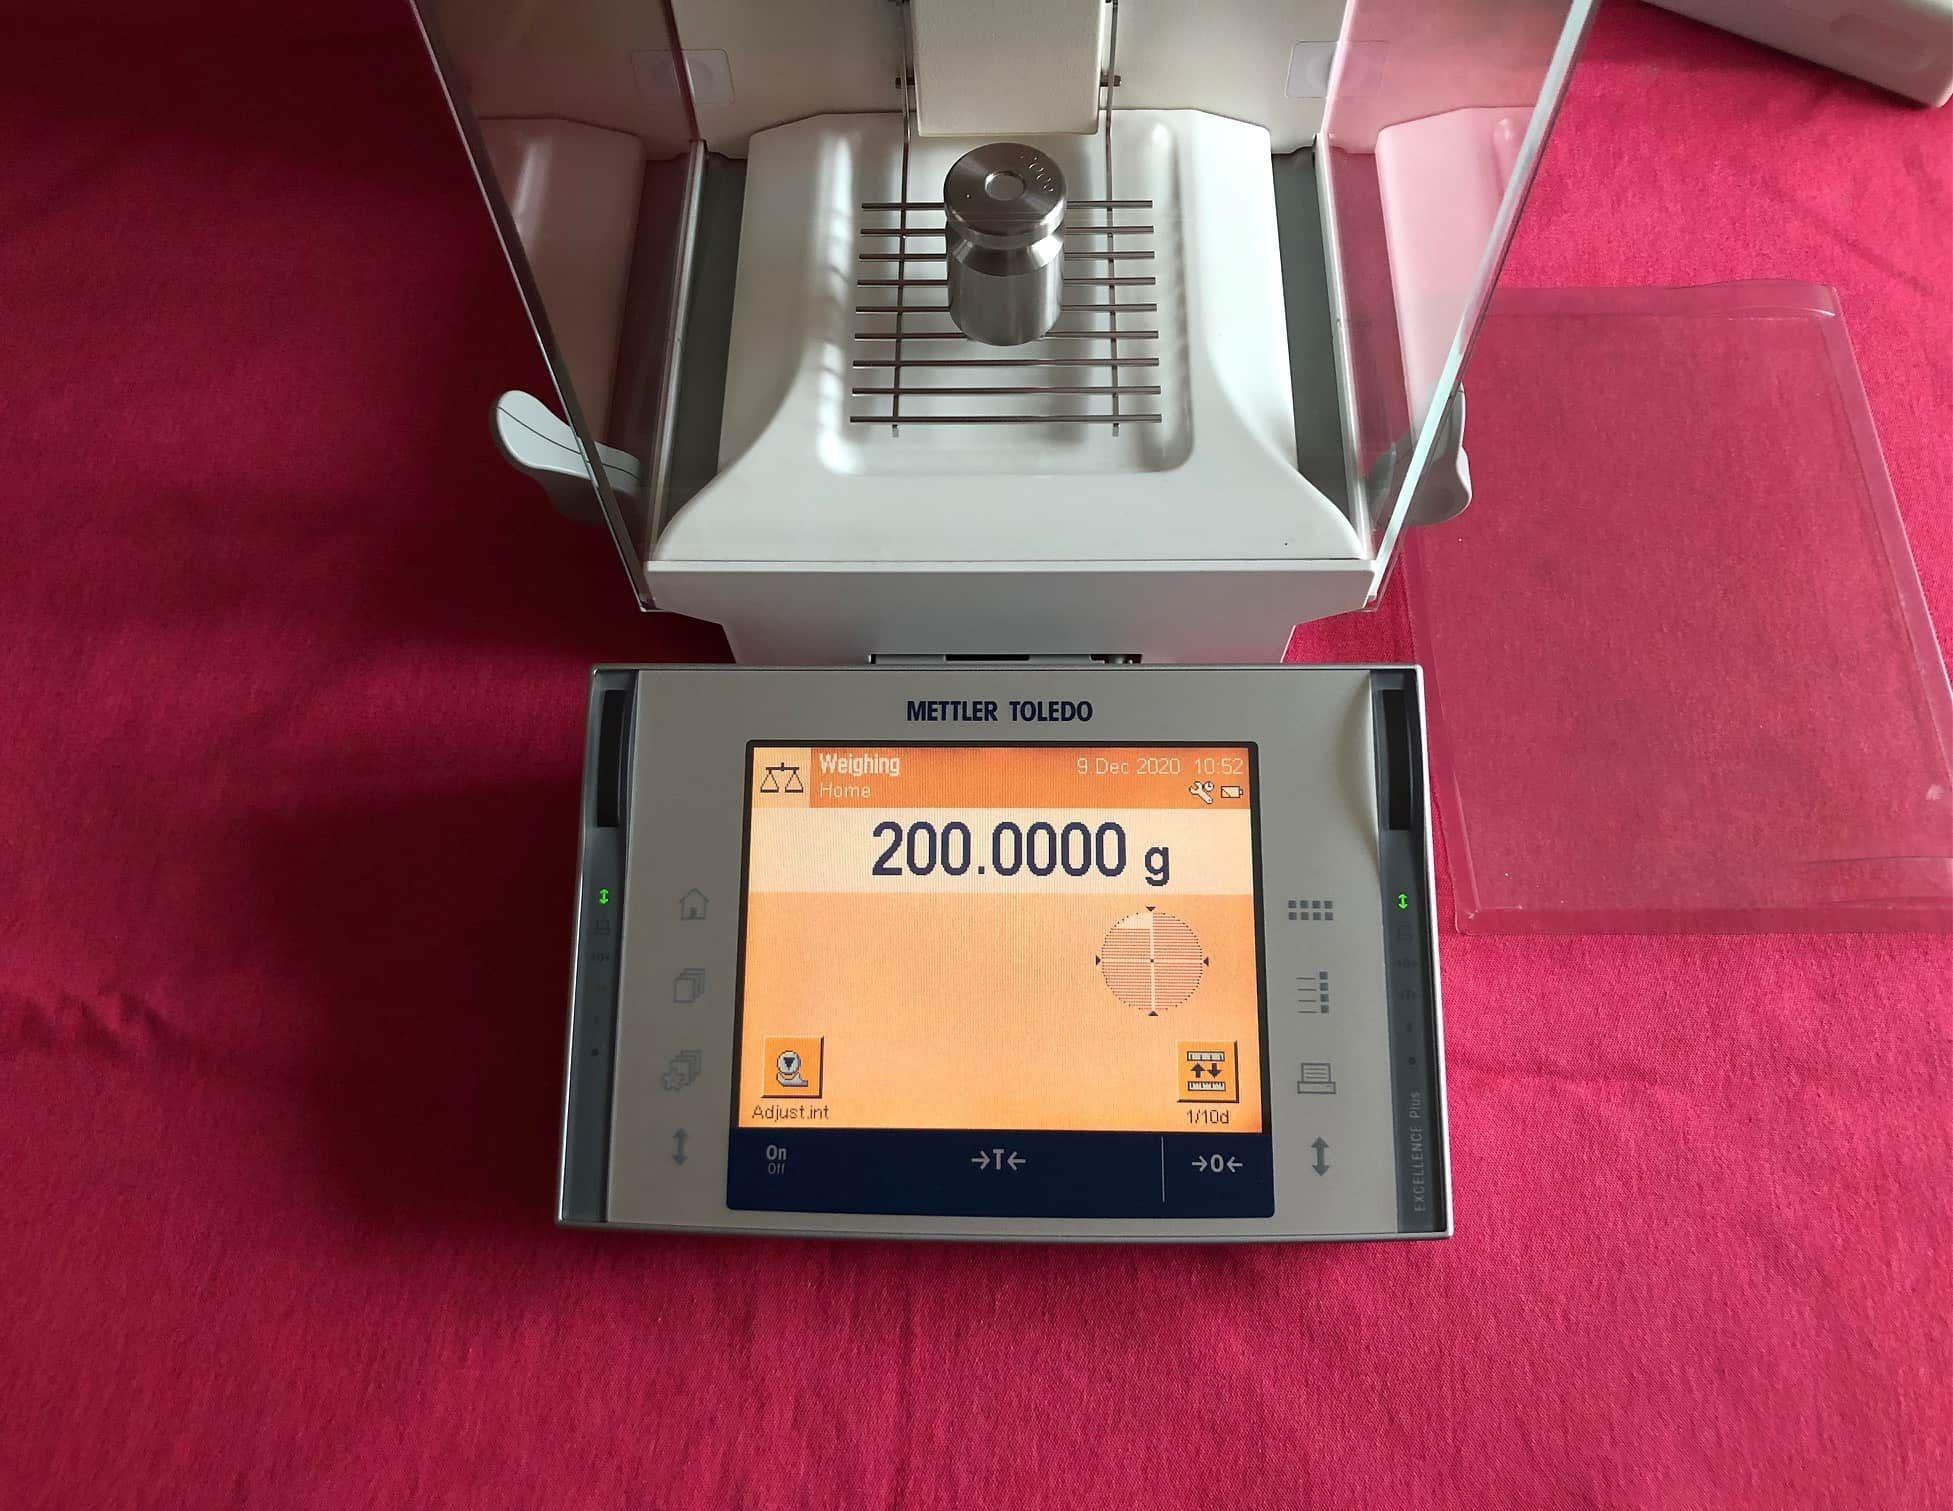 Mettler Toledo XP204 Analytical Balance Scale 220.0000g